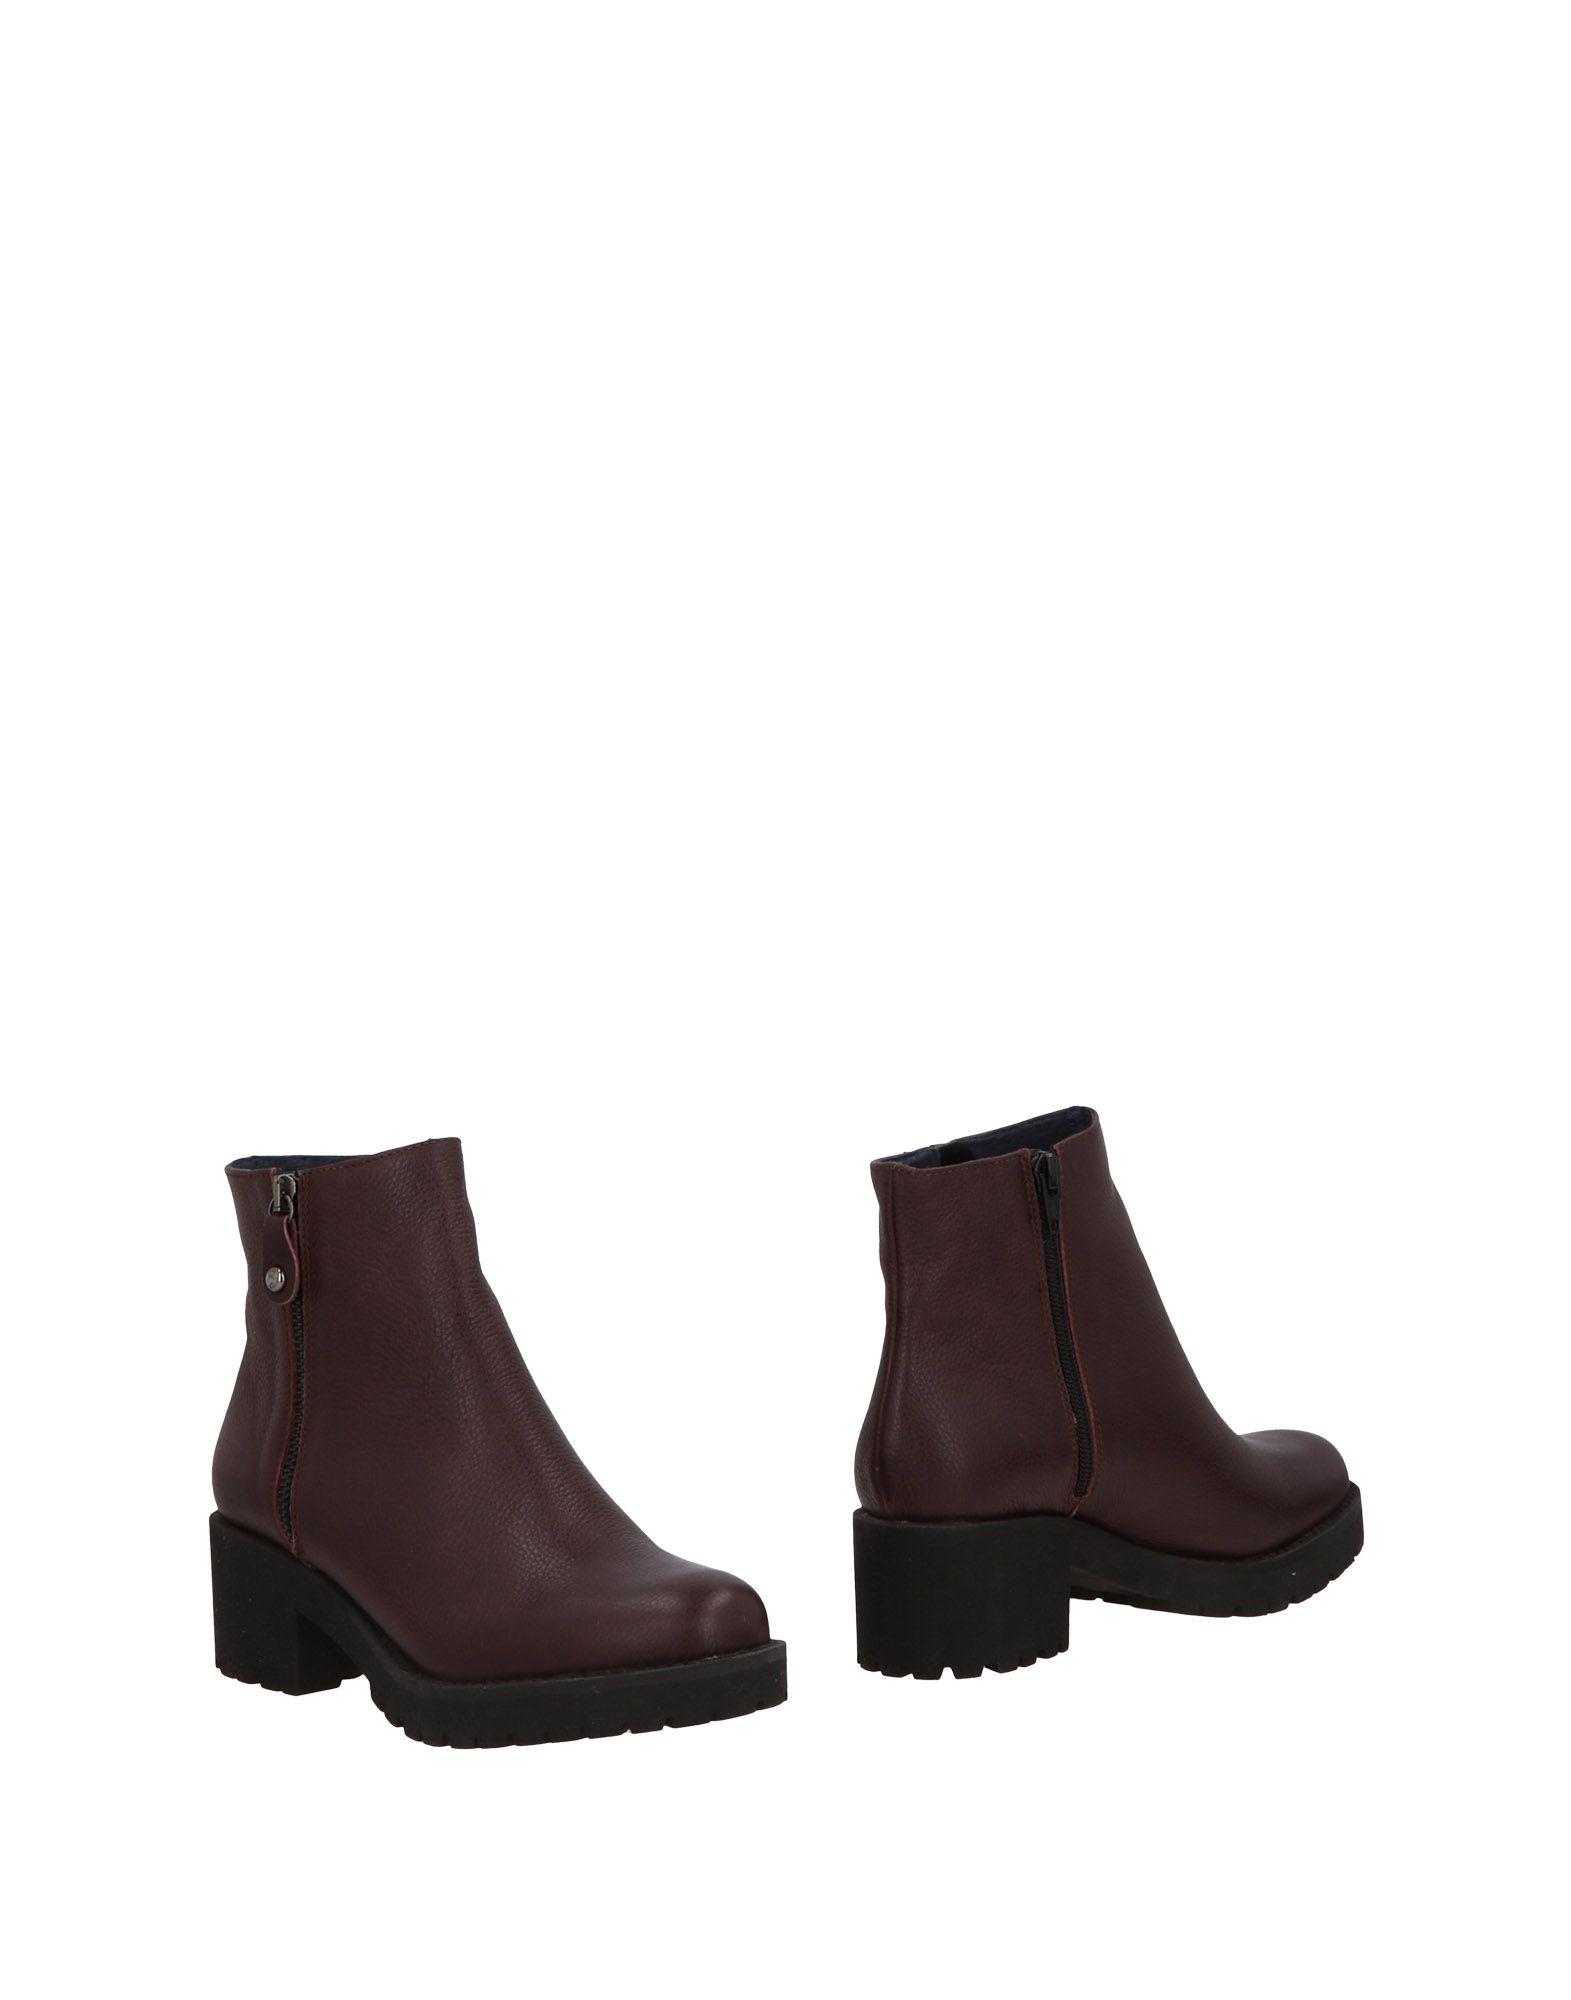 Docksteps Stiefelette Schuhe Damen  11477815QB Gute Qualität beliebte Schuhe Stiefelette a94aa2